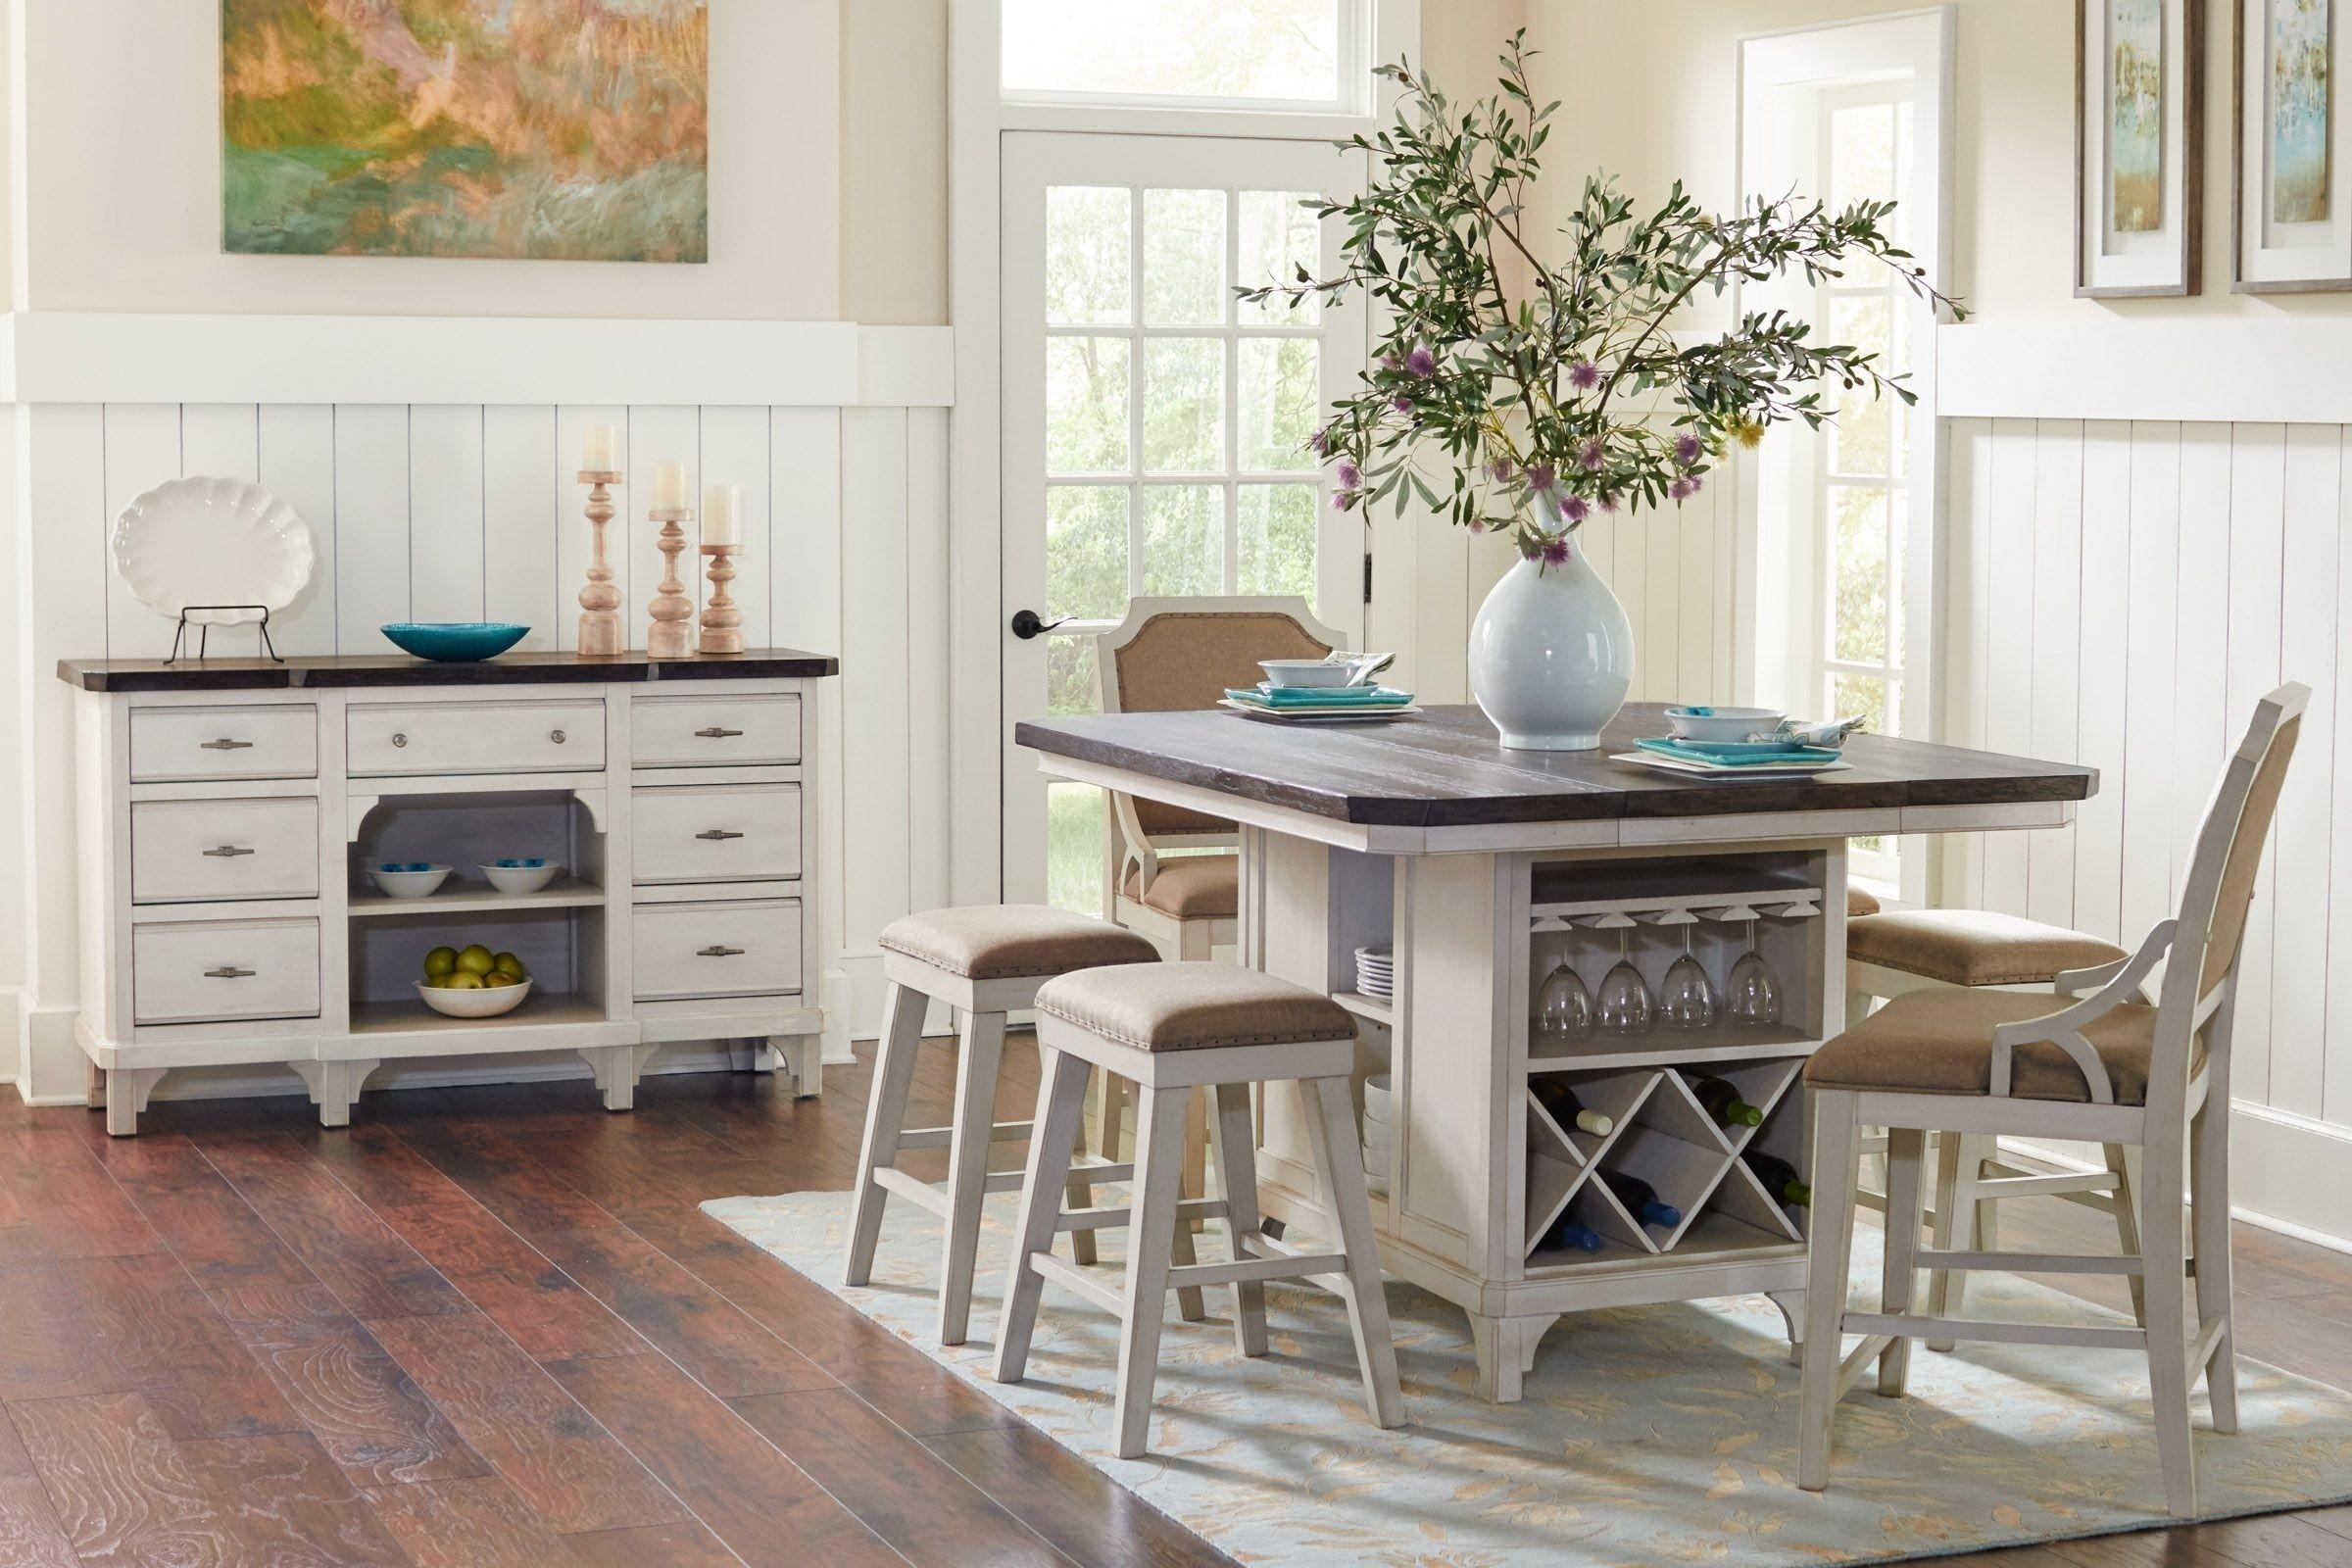 kitchen table with storage underneath